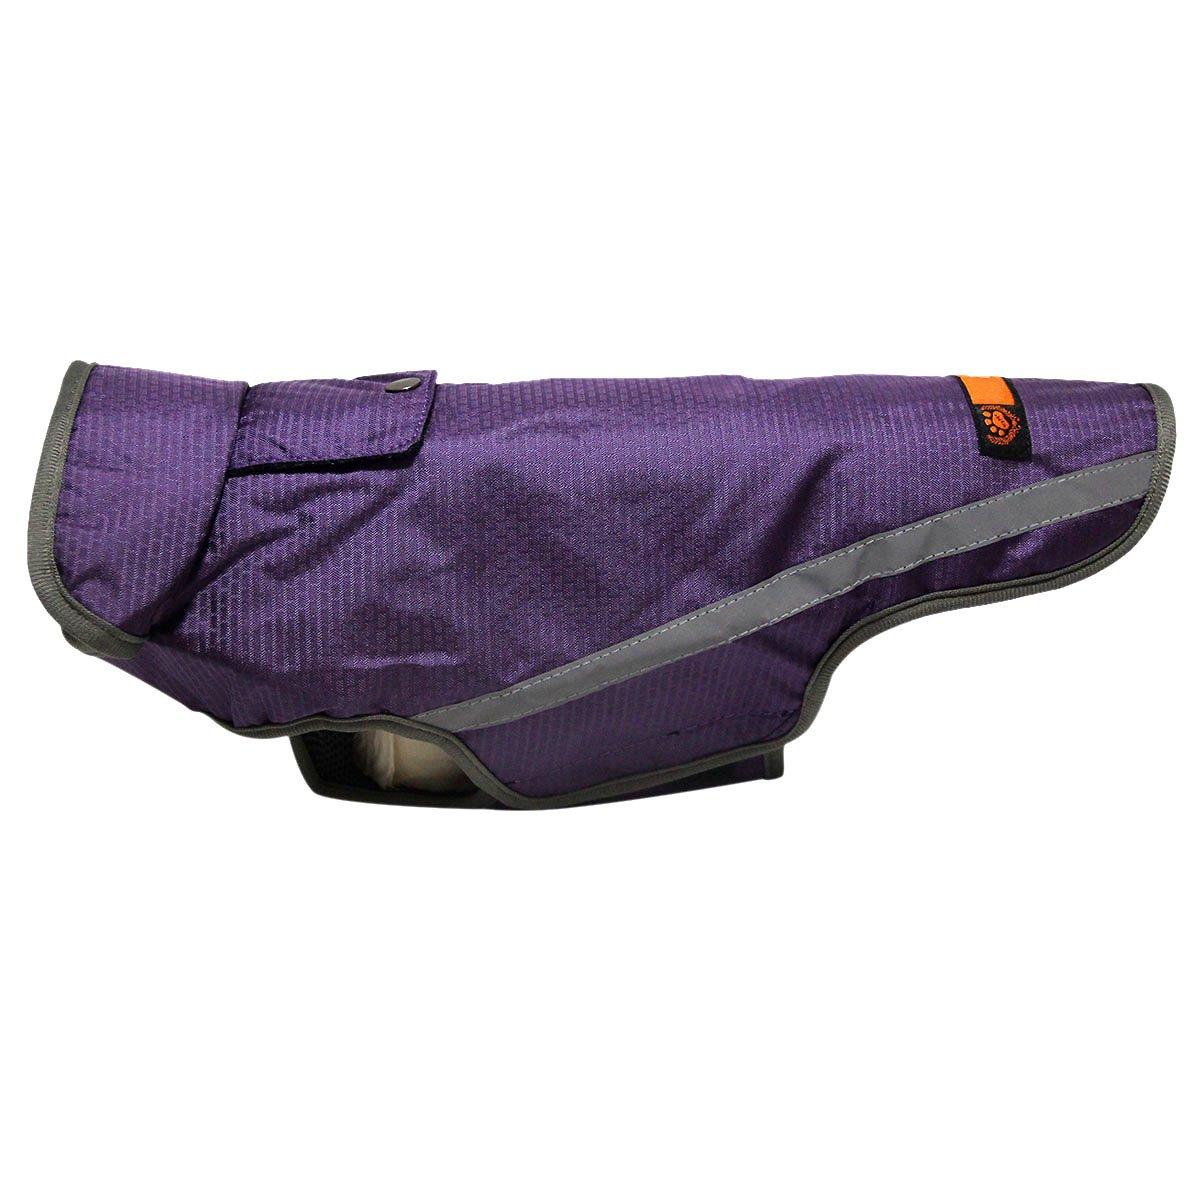 JoyDaog Premium Outdoor Sport Waterproof Raincoat Dog Jacket,Super Breathable Mesh Lined Dog Coats for Large Dogs,Black XXXL